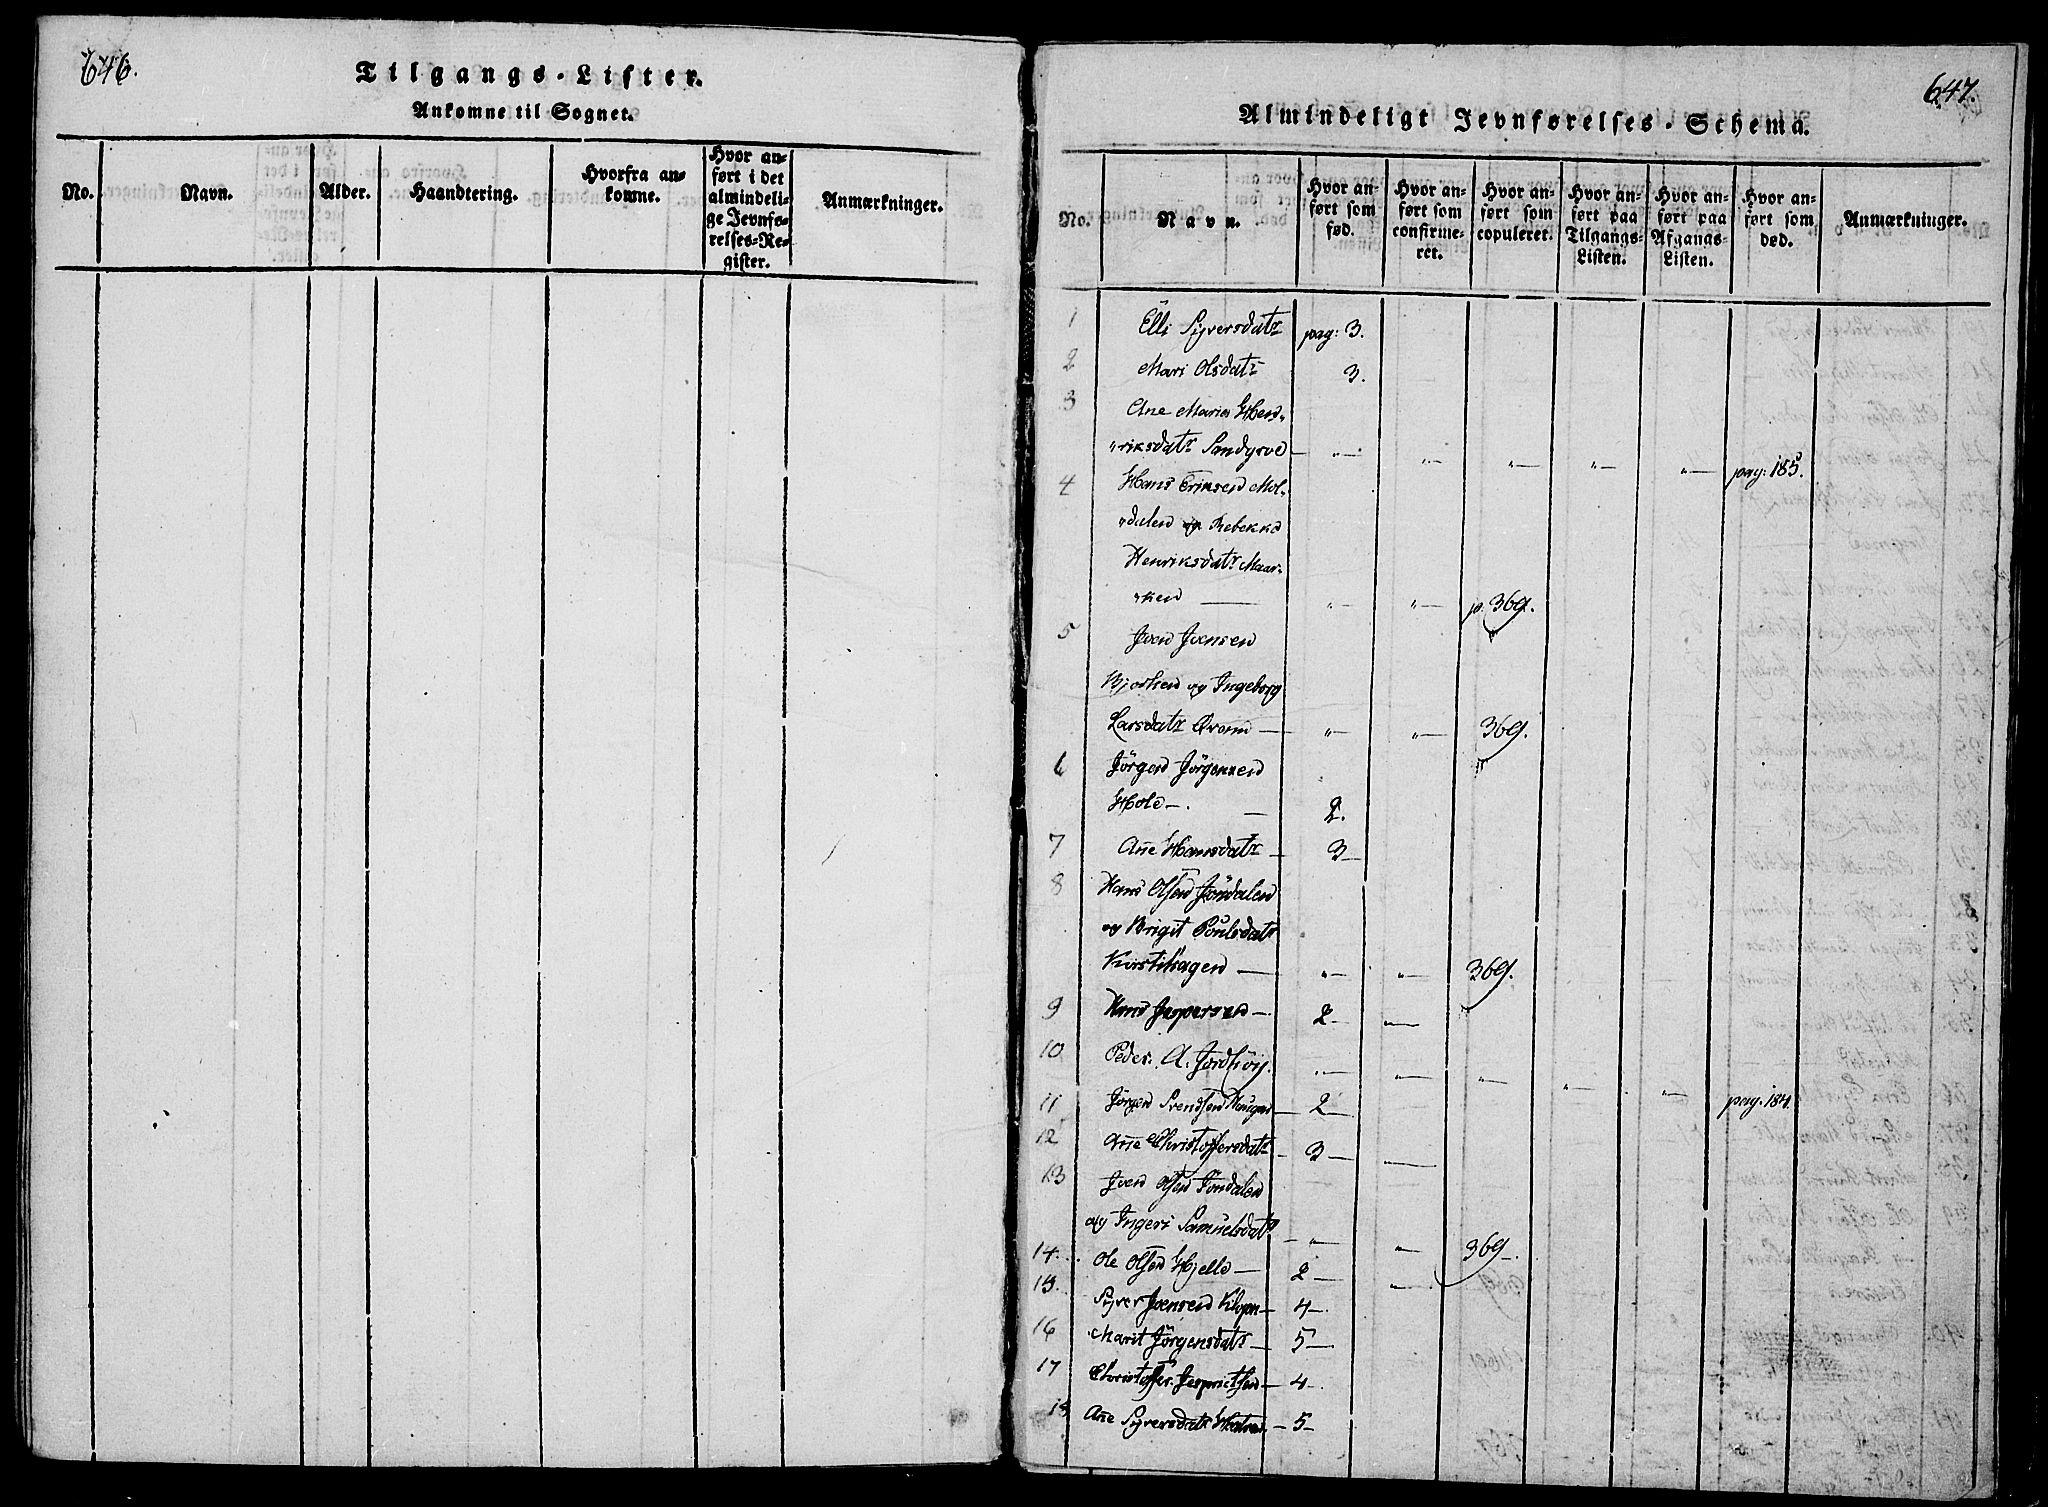 SAH, Lesja prestekontor, Ministerialbok nr. 4, 1820-1829, s. 646-647